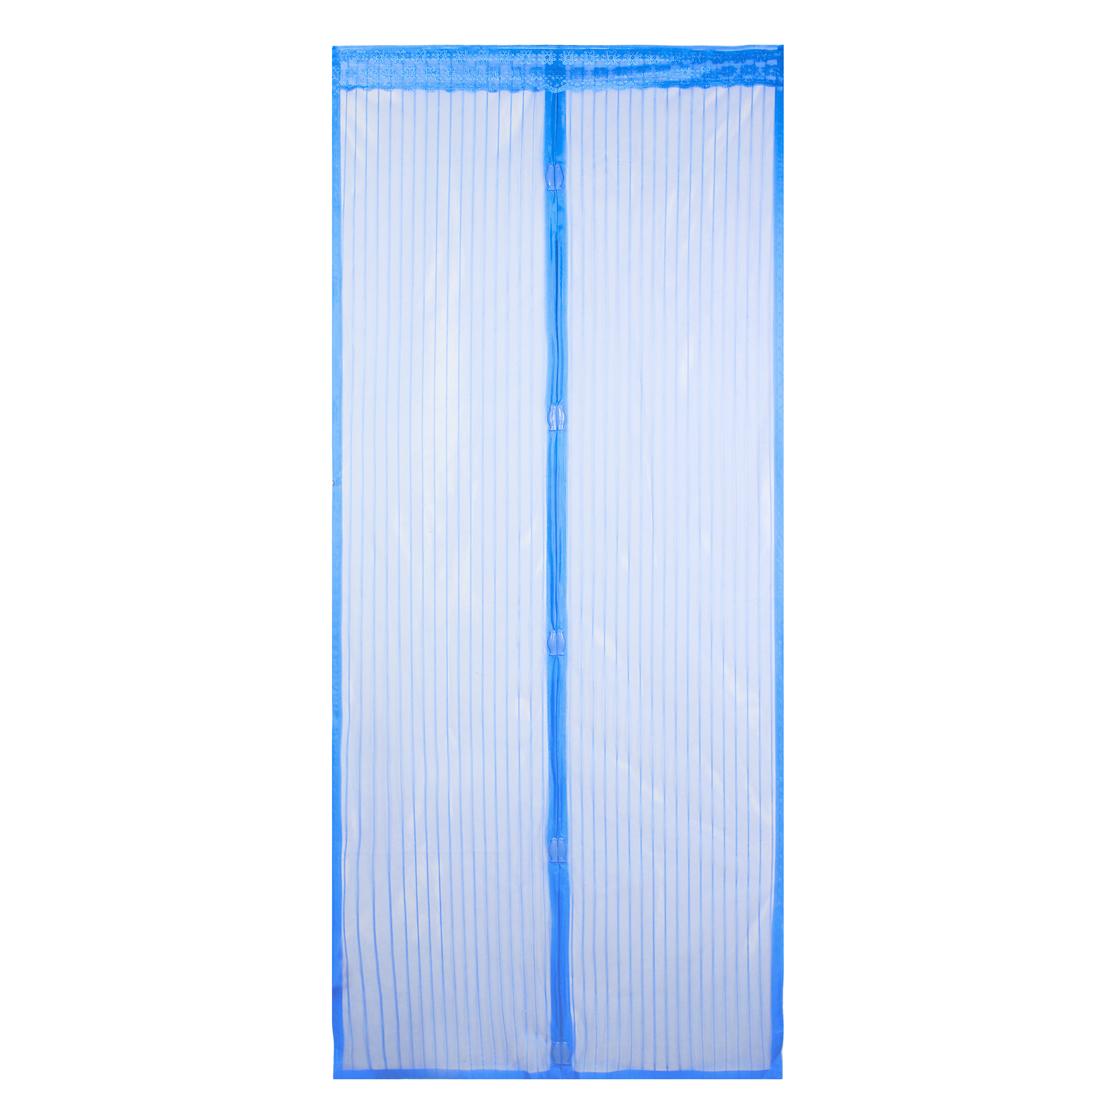 "Blue Floral Edge Decor Nylon Door Panel Panels Magnetic Curtain 81"" x 18"""